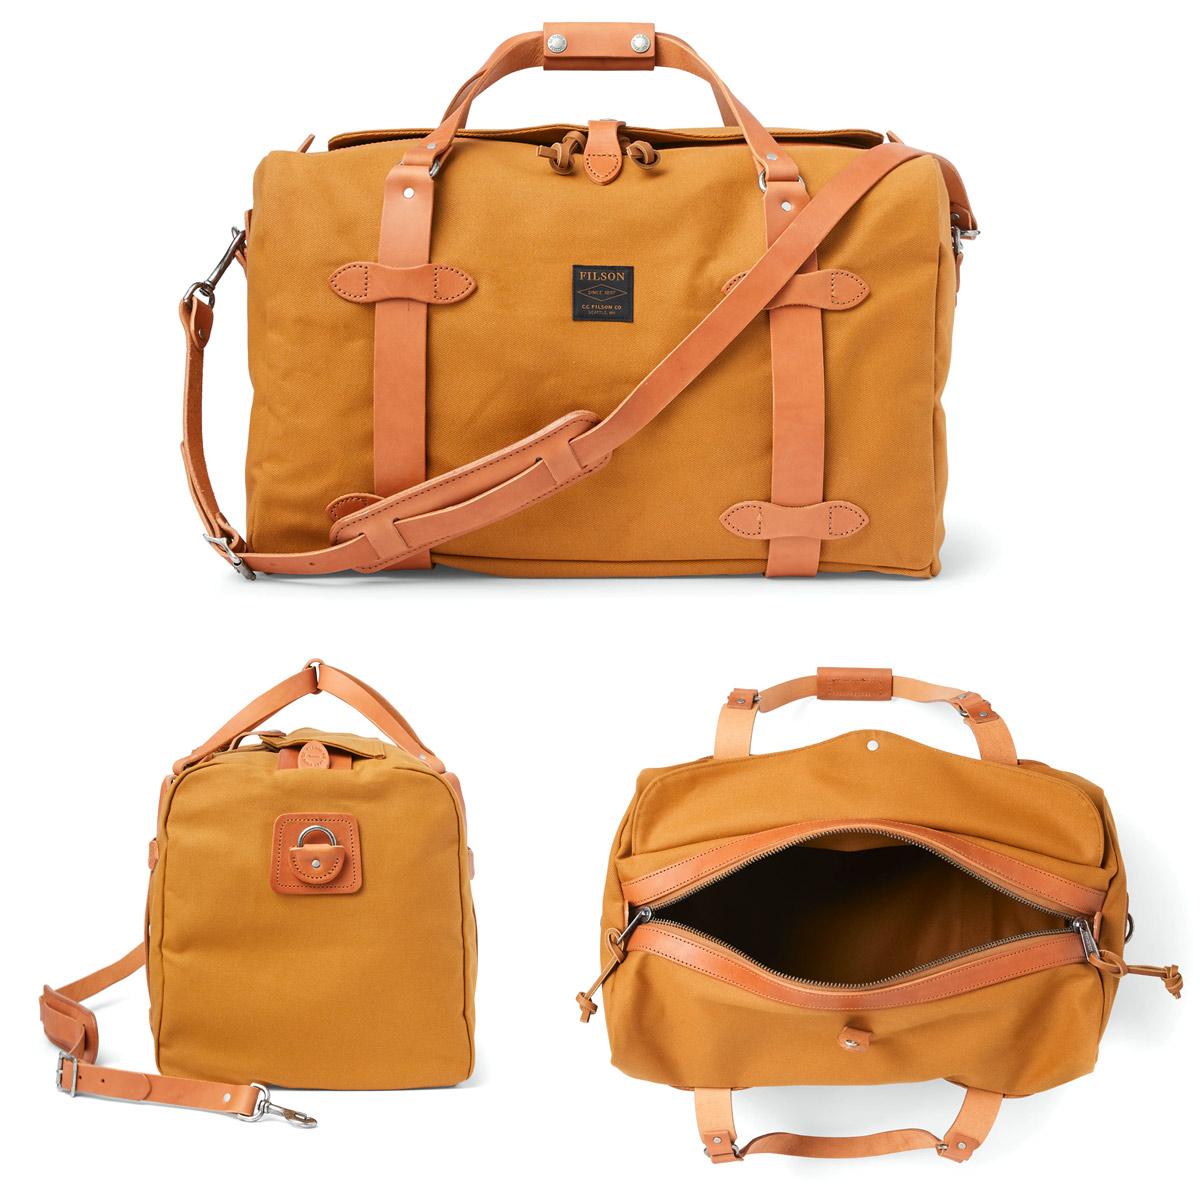 Filson Duffle Medium Chessie Tan, stoere duffel die voldoet aan de maximale handbagage afmetingen